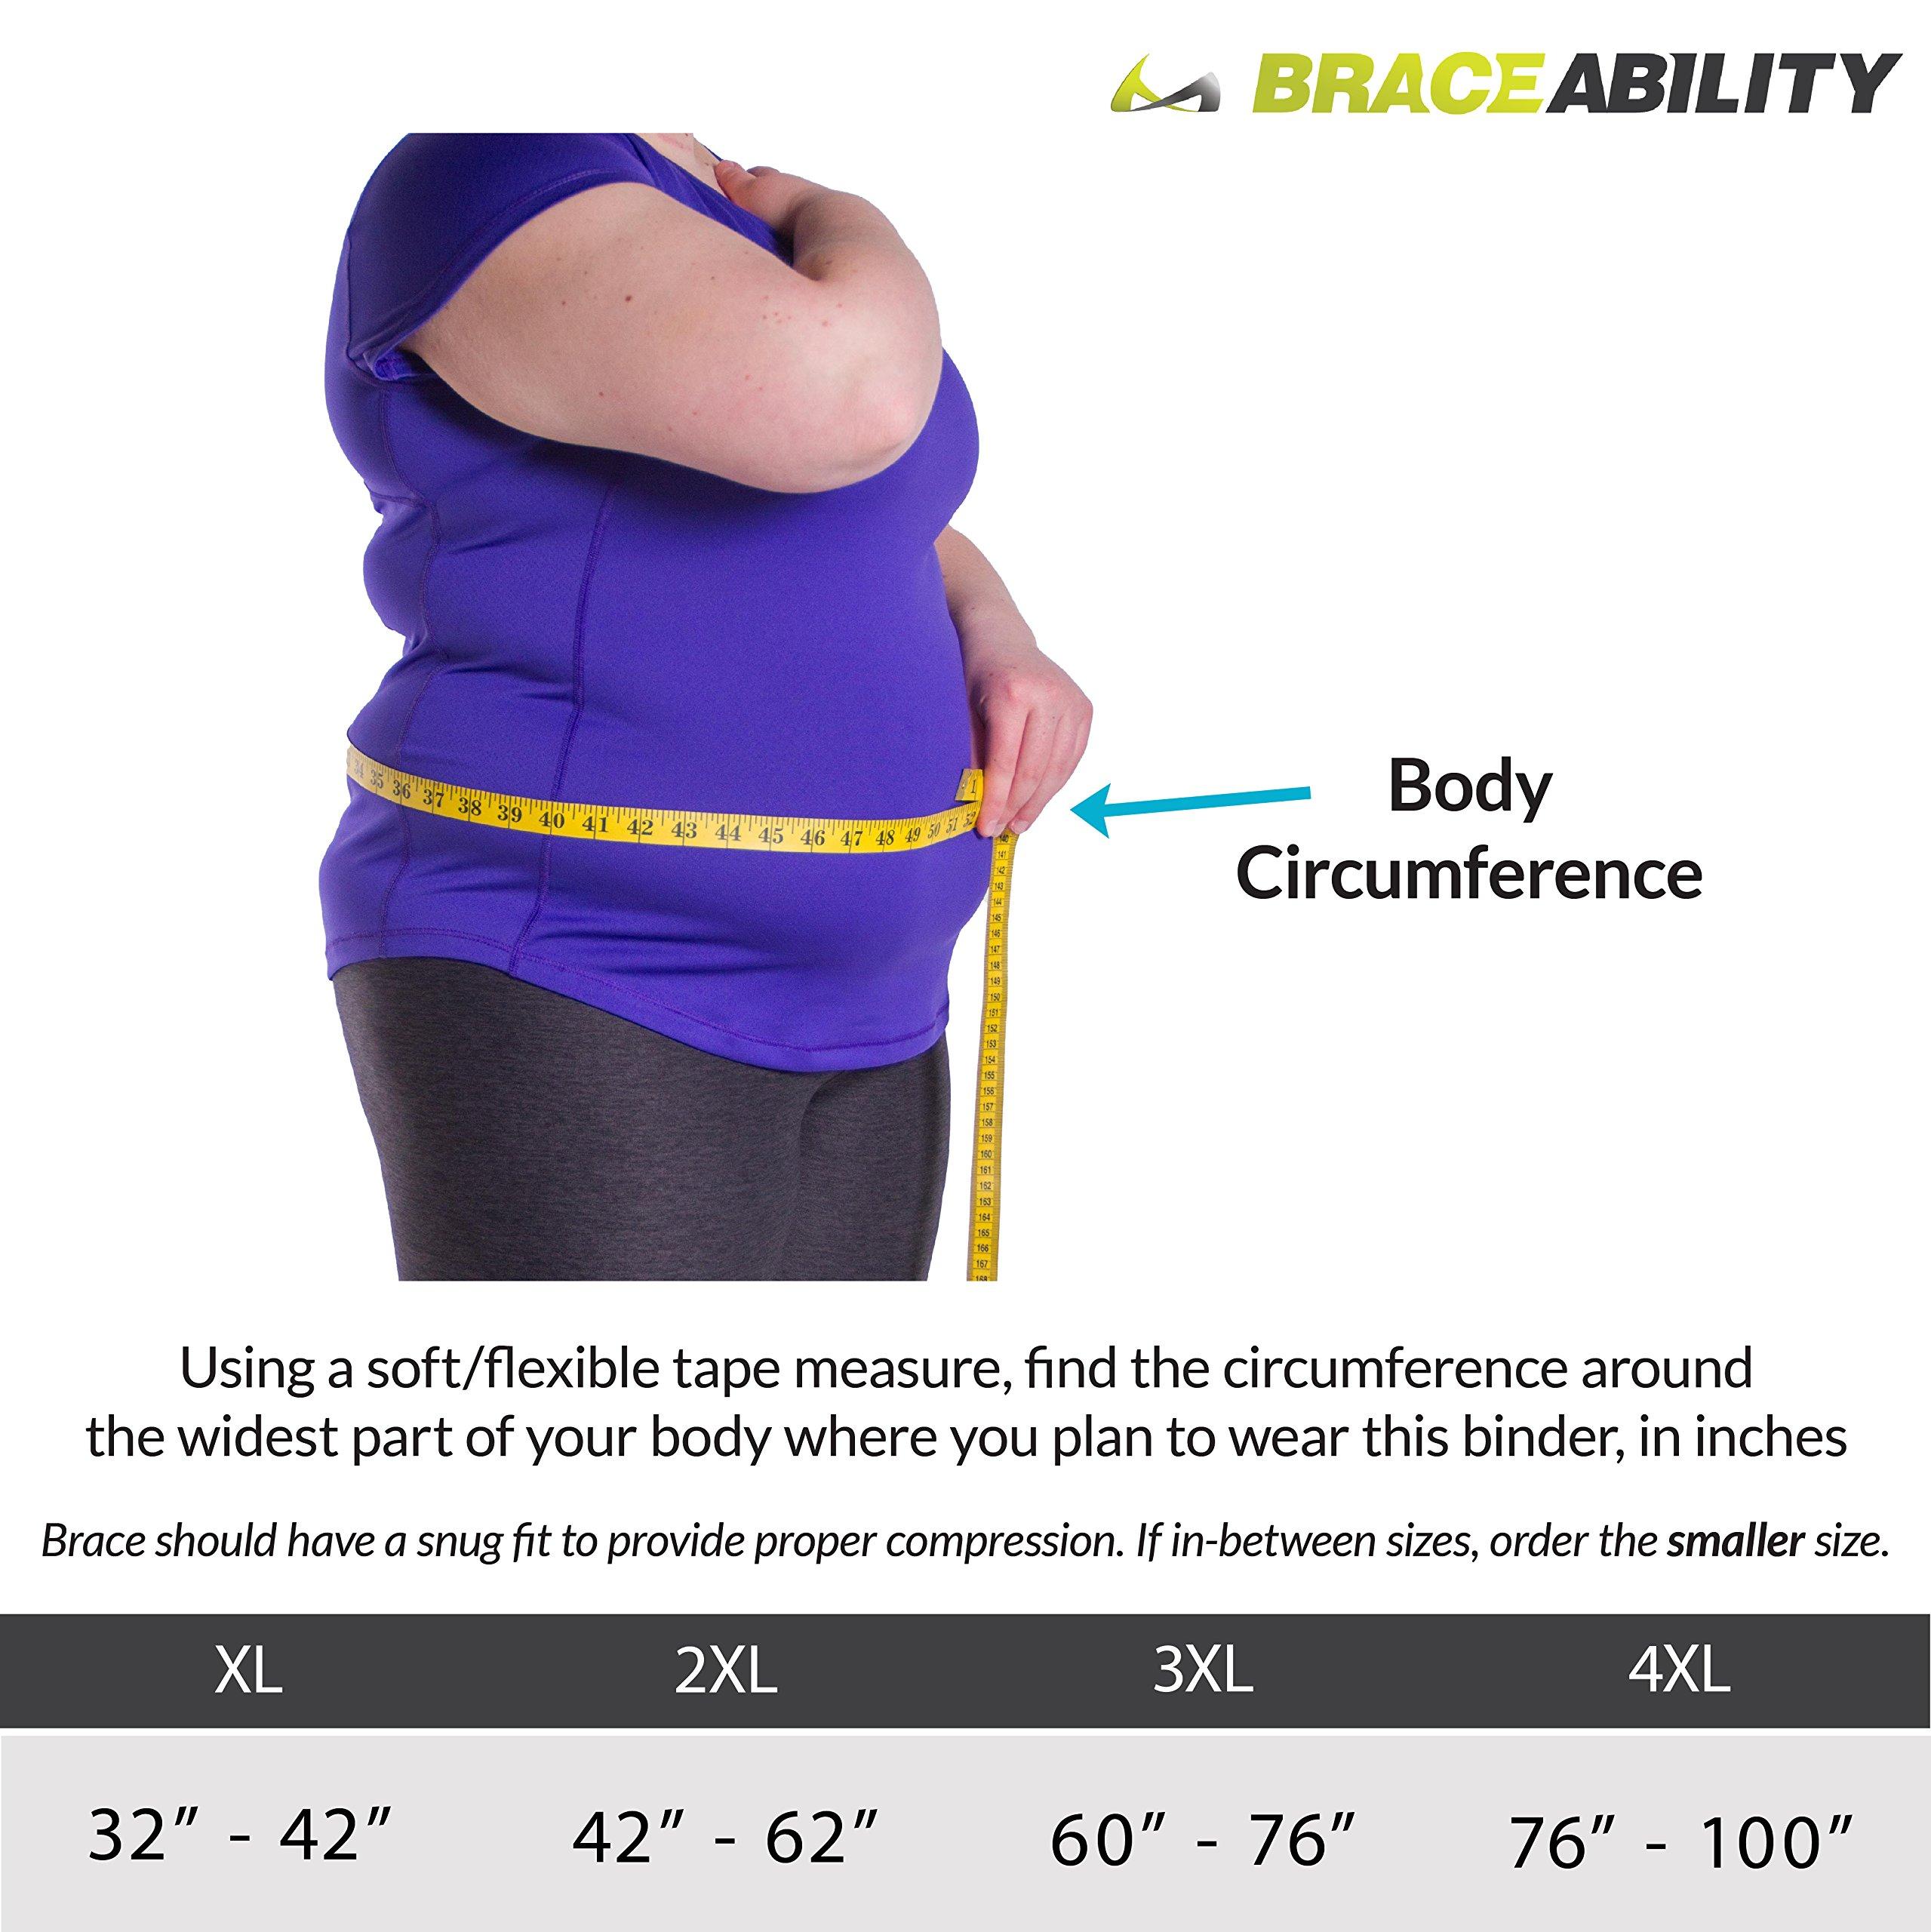 BraceAbility 2XL Plus Size Bariatric Abdominal Binder For